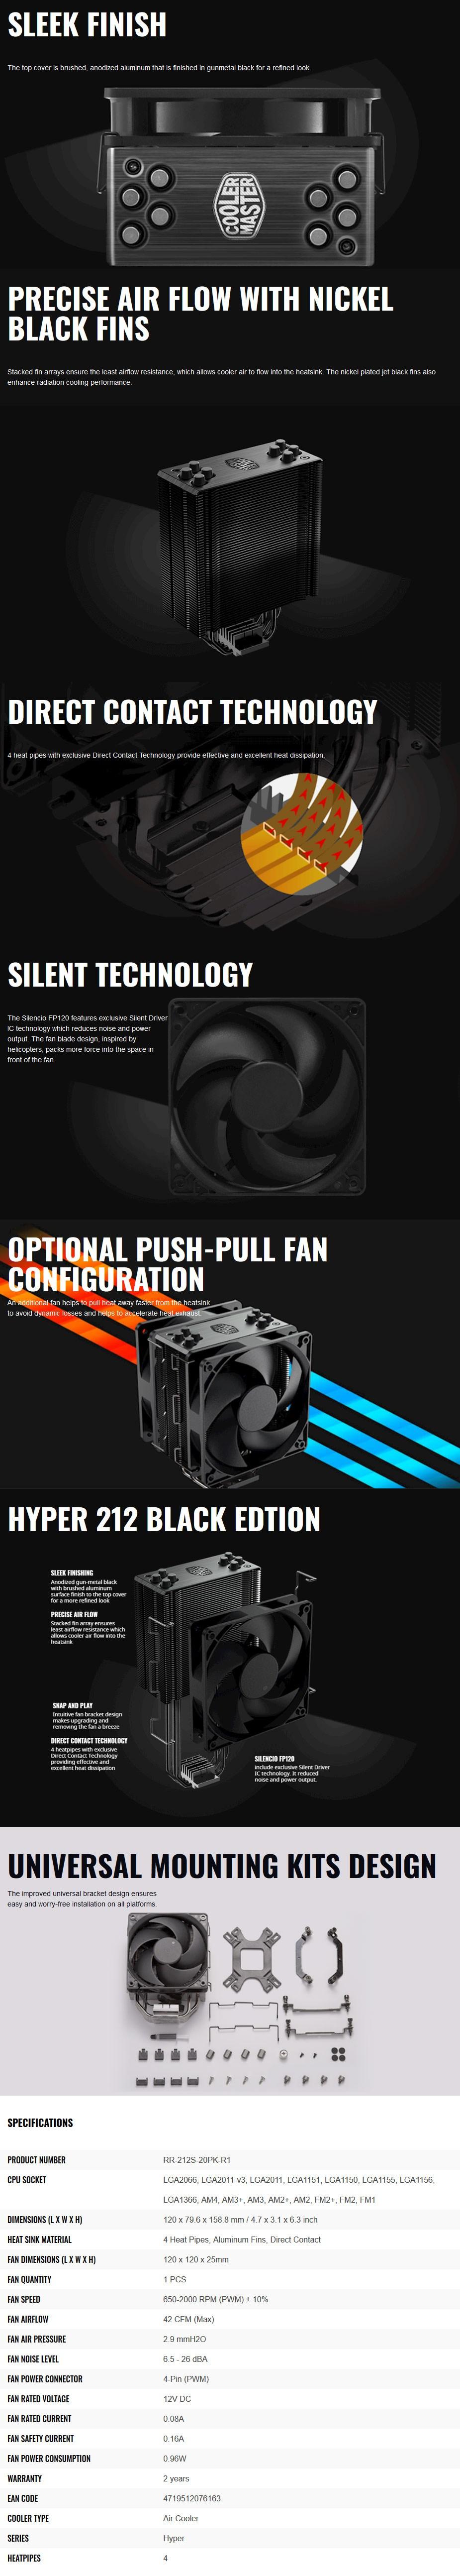 cooler-master-hyper-212-cpu-cooler-black-edition-ac32318-9.jpg